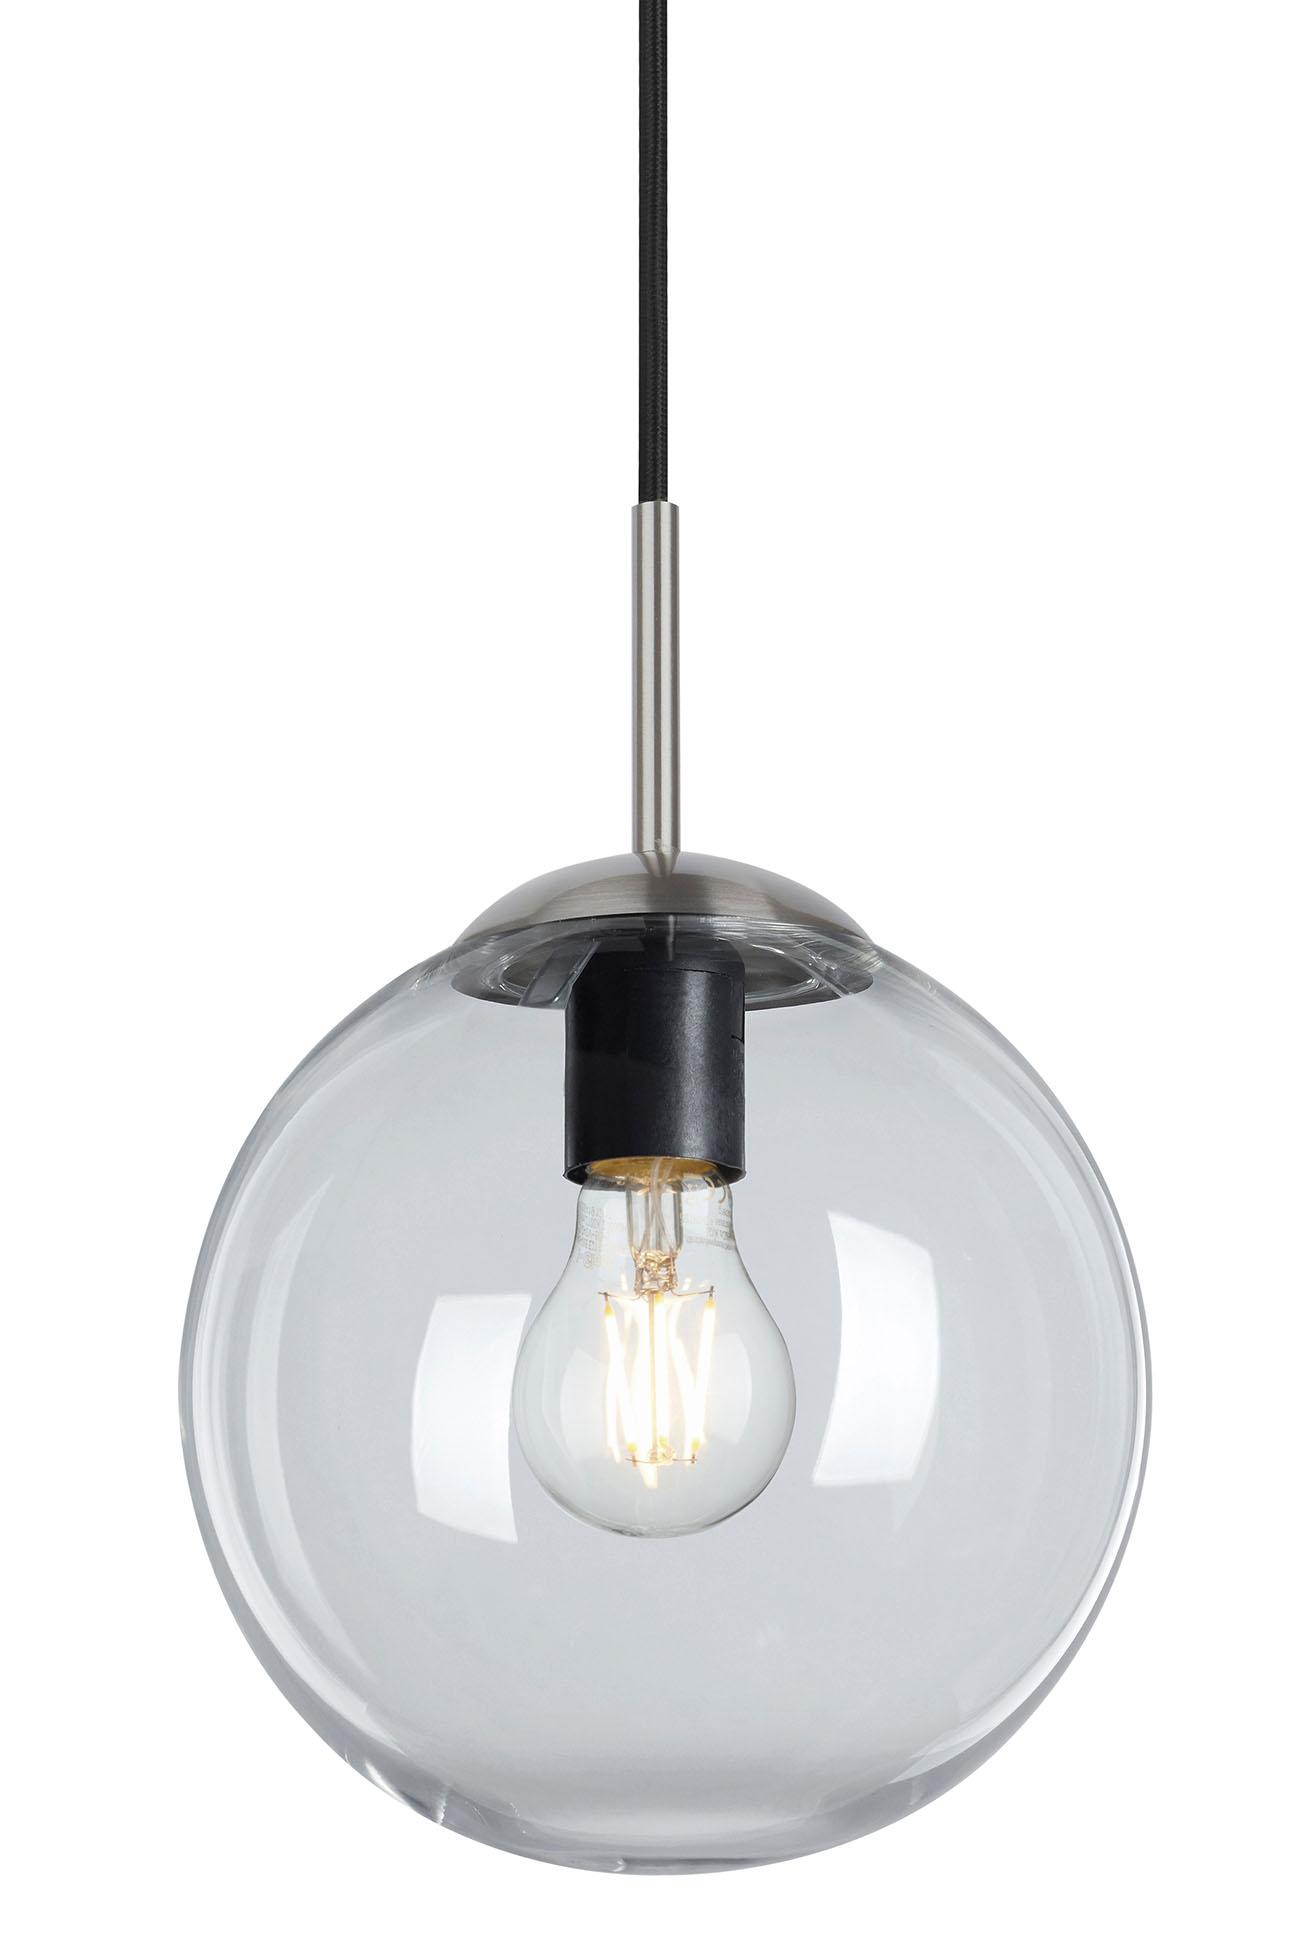 LED Pendelleuchte, Ø 20 cm, max. 40 W, Matt-Nickel